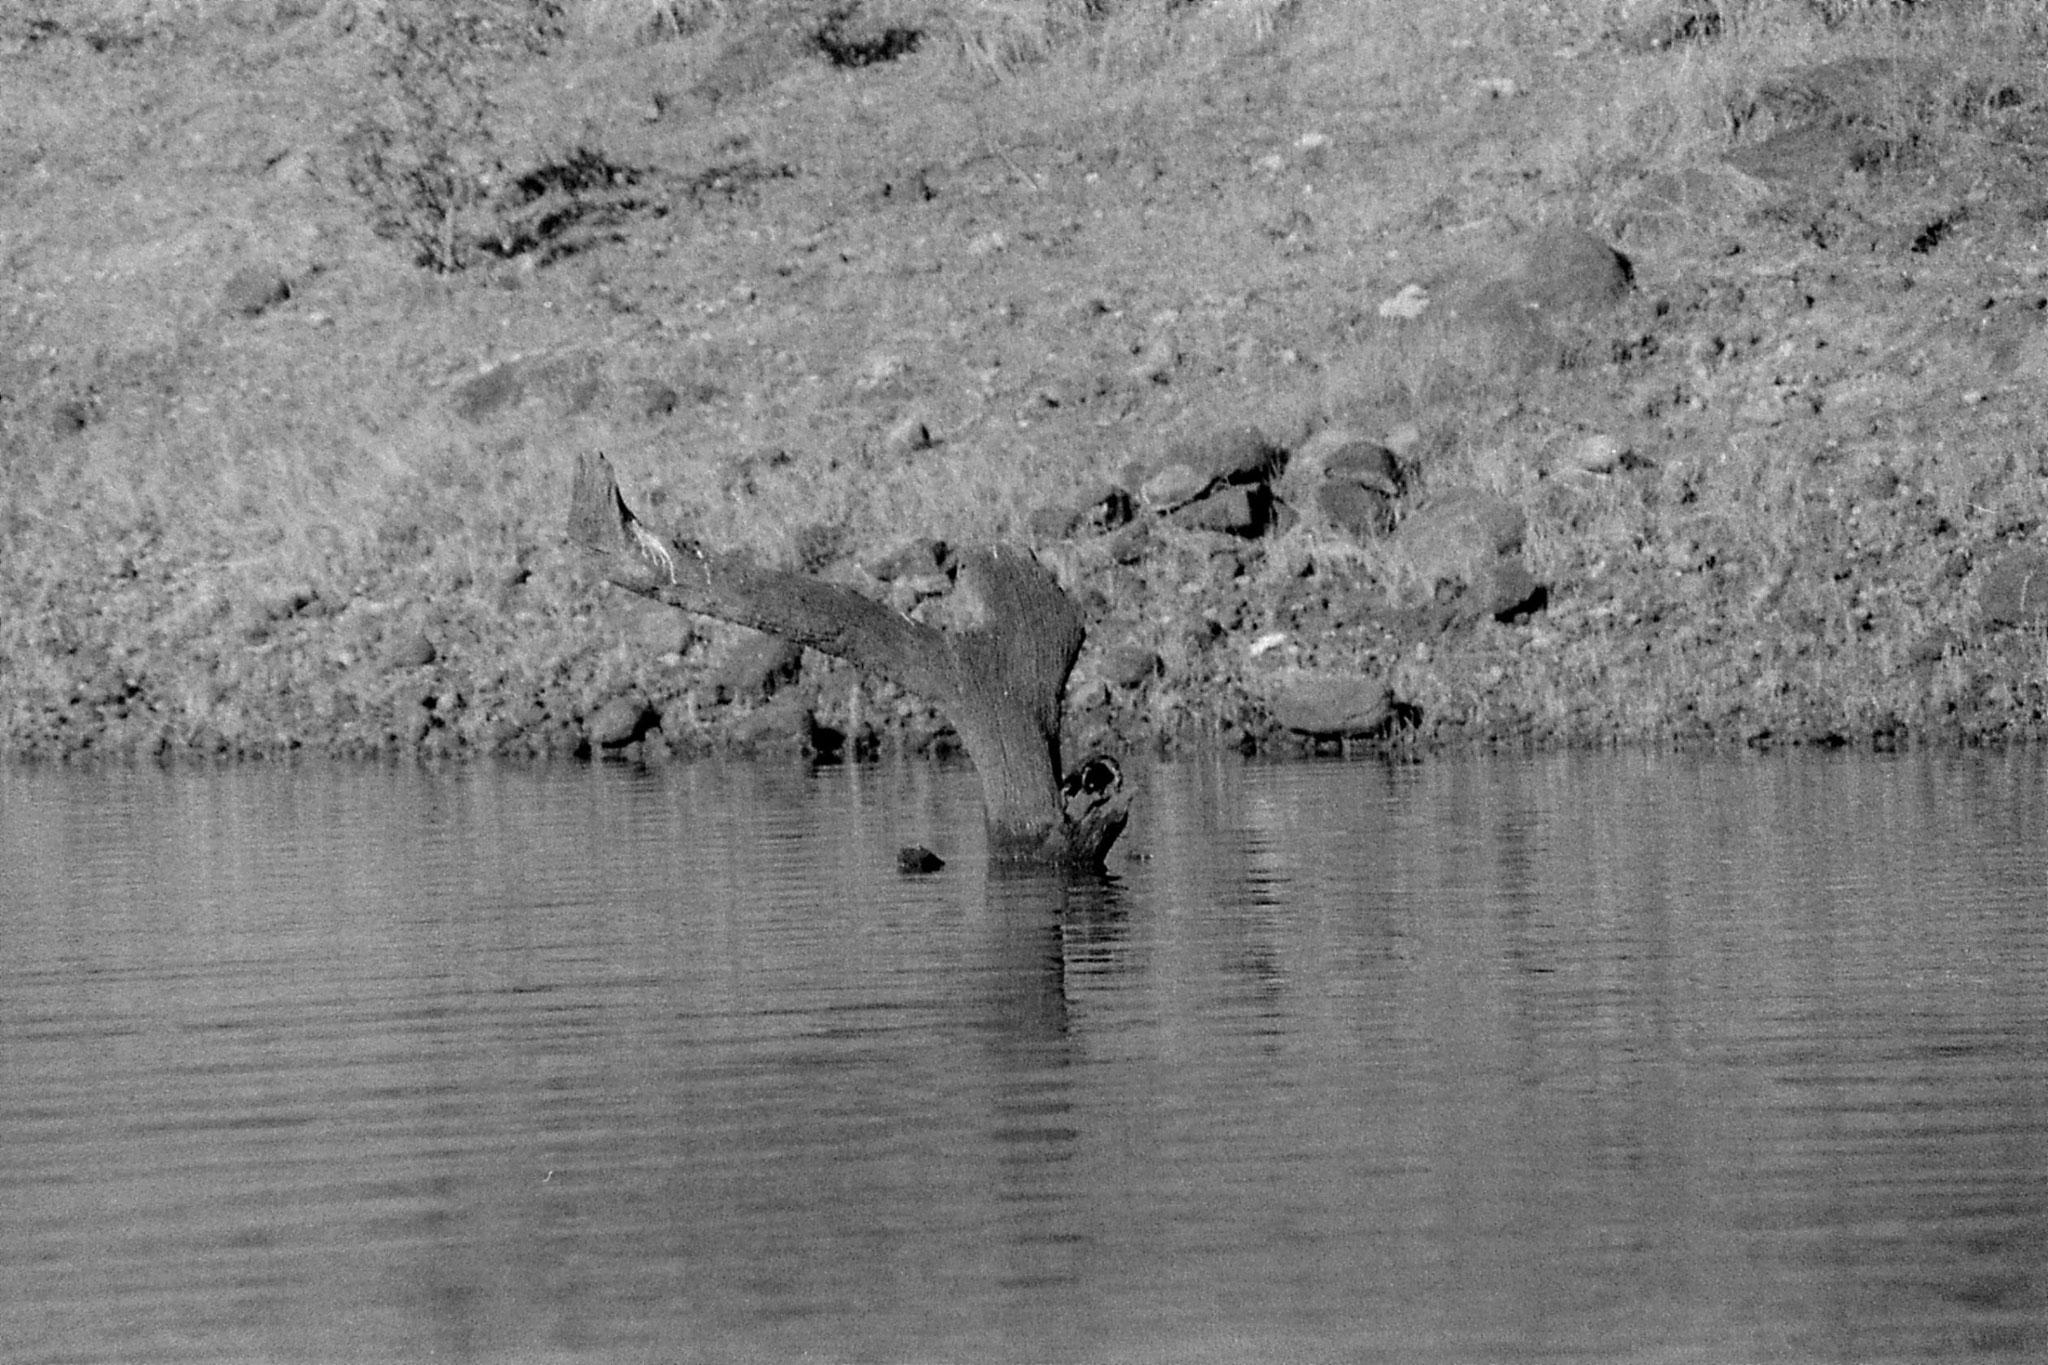 097/26: 23/2/1990 Periyar turtle